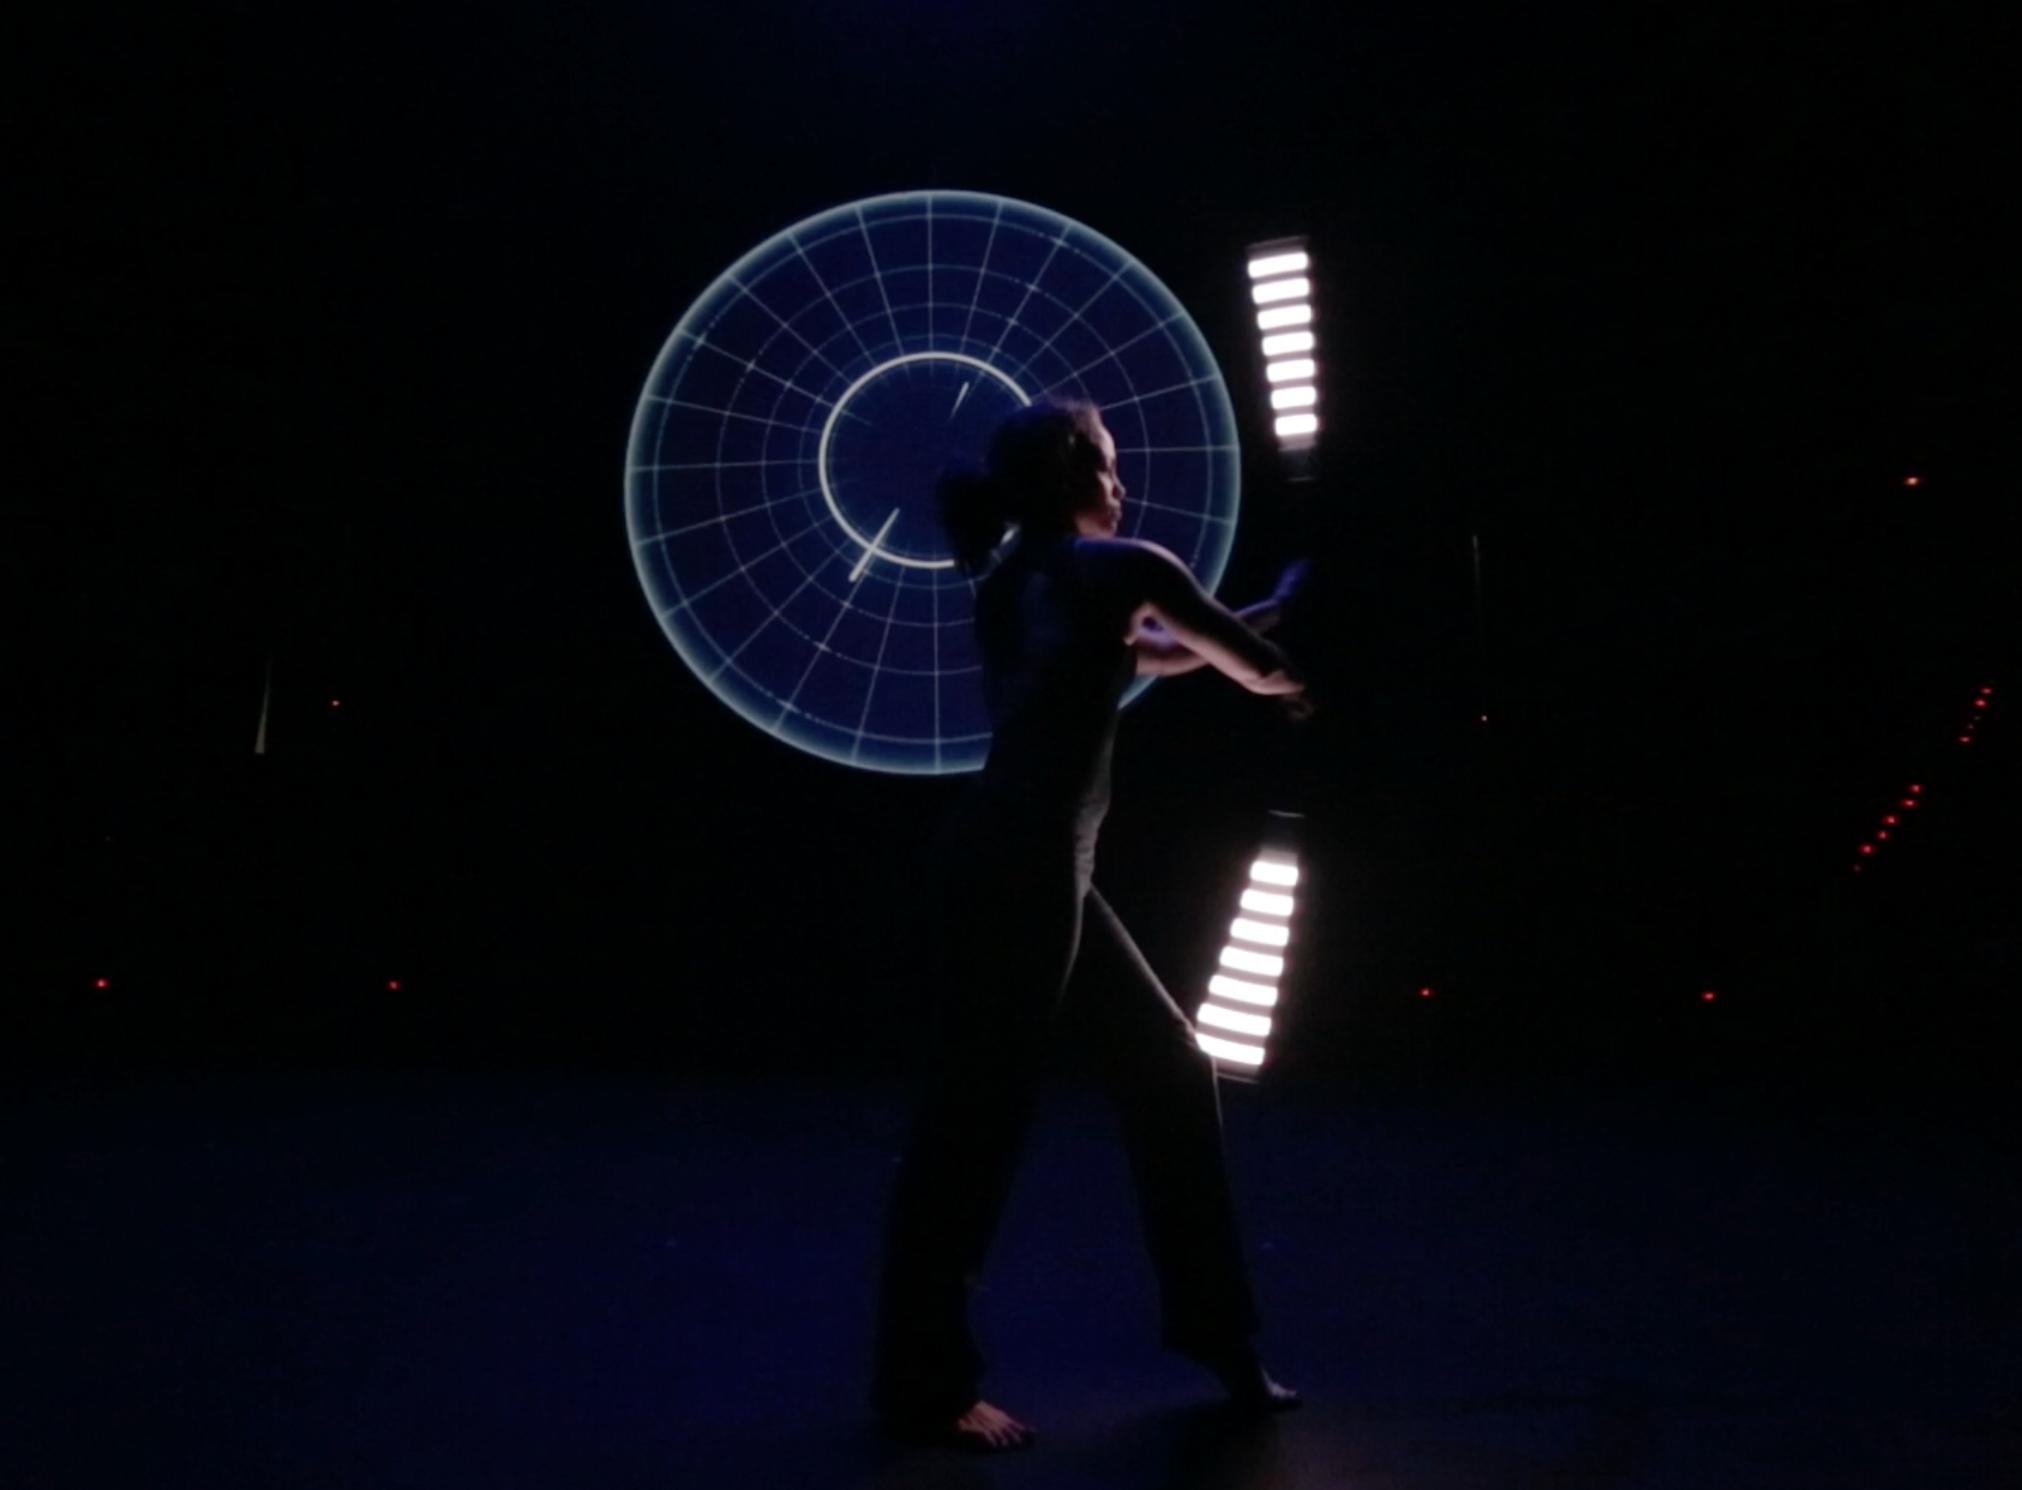 La Vuelta a mi mundo teacro mapping LED 1